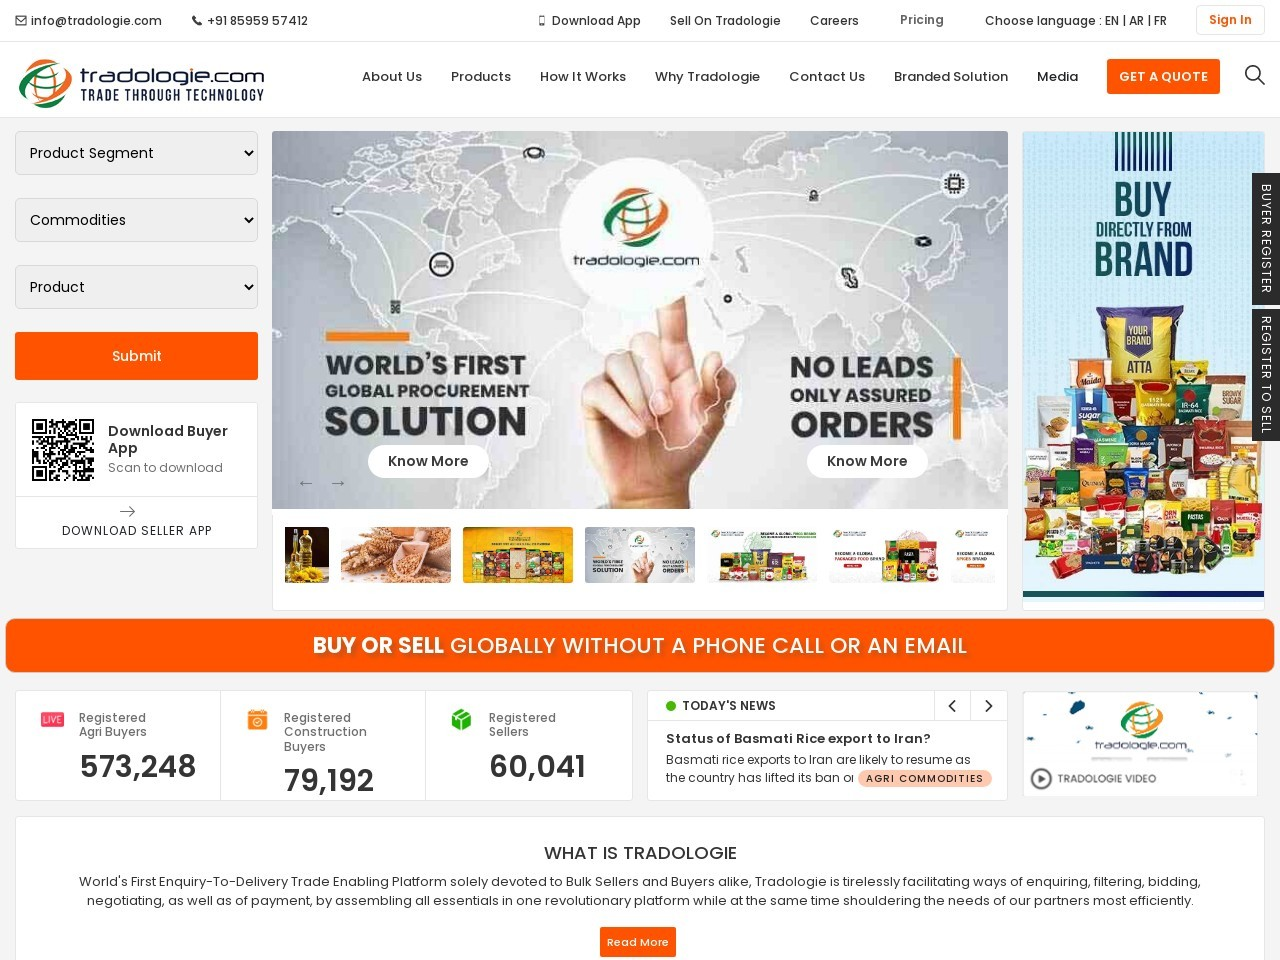 Export Sona Masooi Rice Globally through Tradologie.com